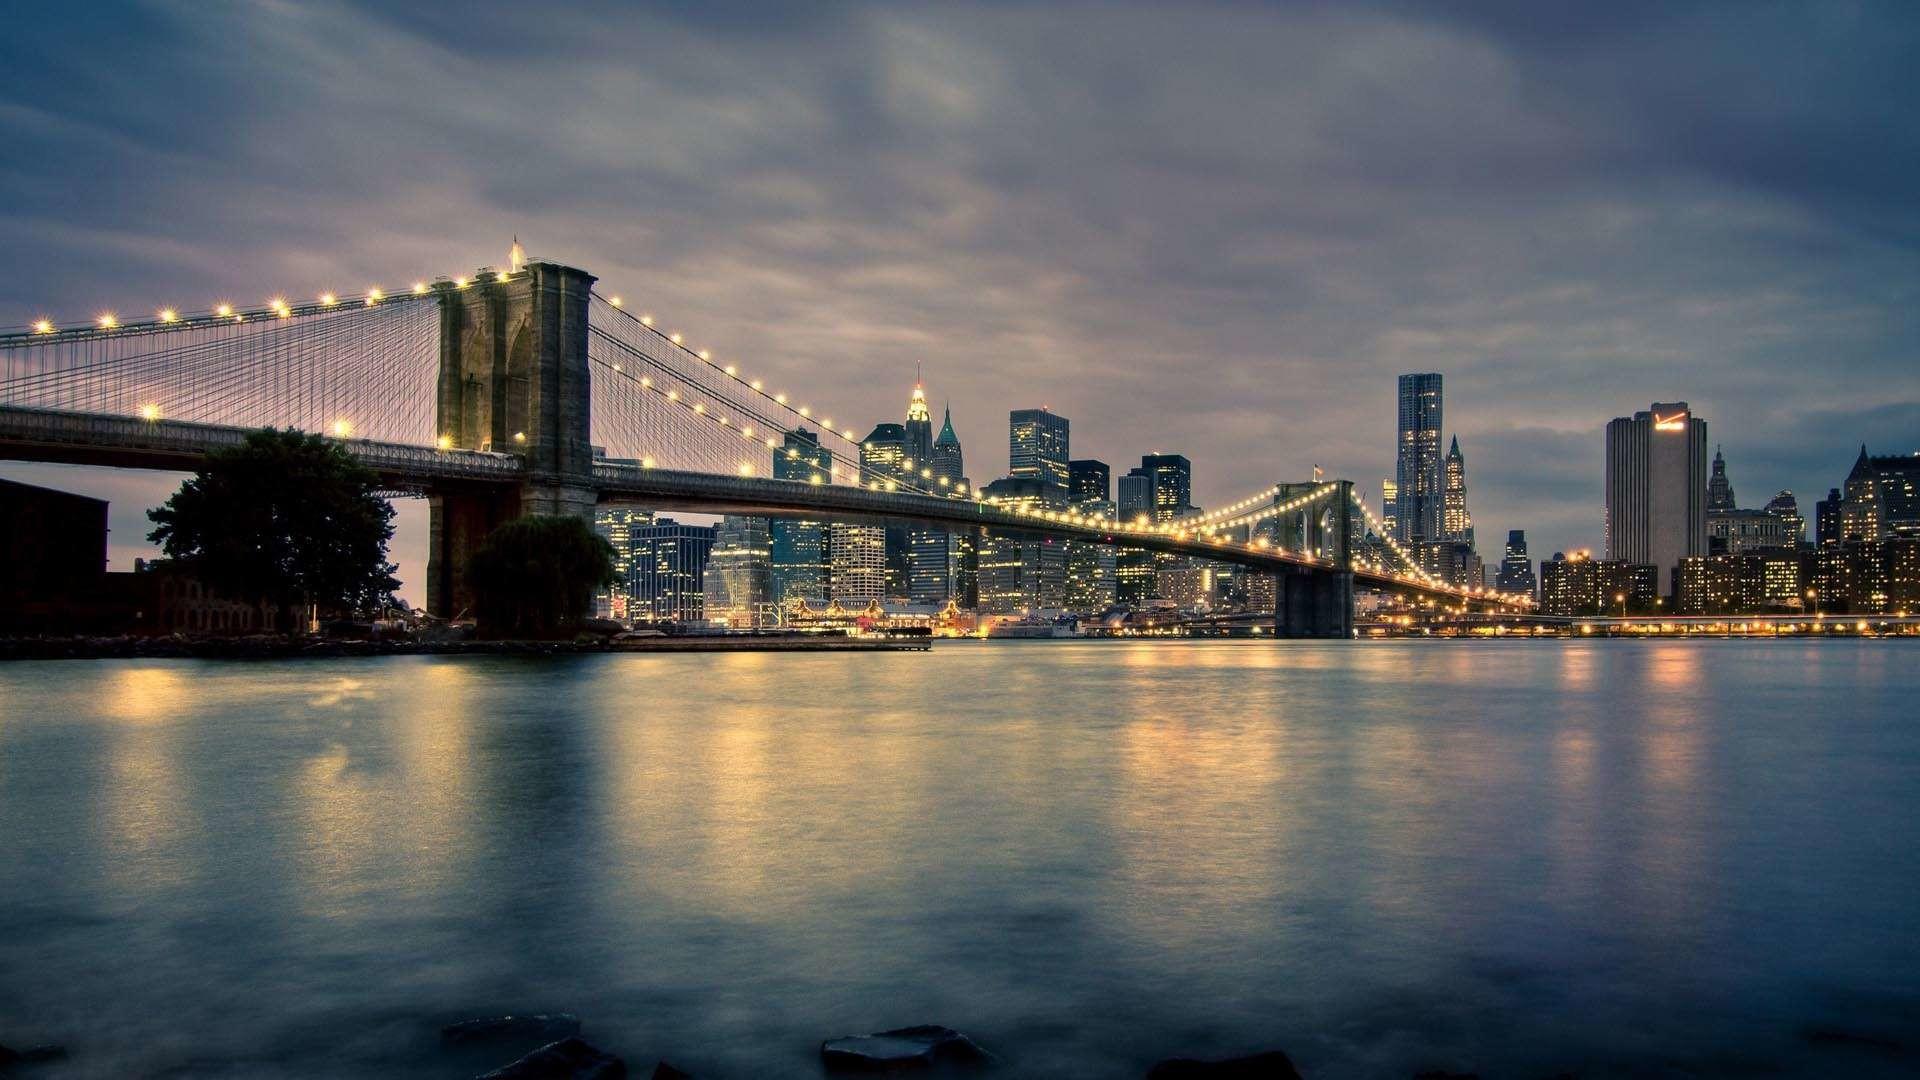 USA Landscape hd wallpapers 1080p Widescreen.